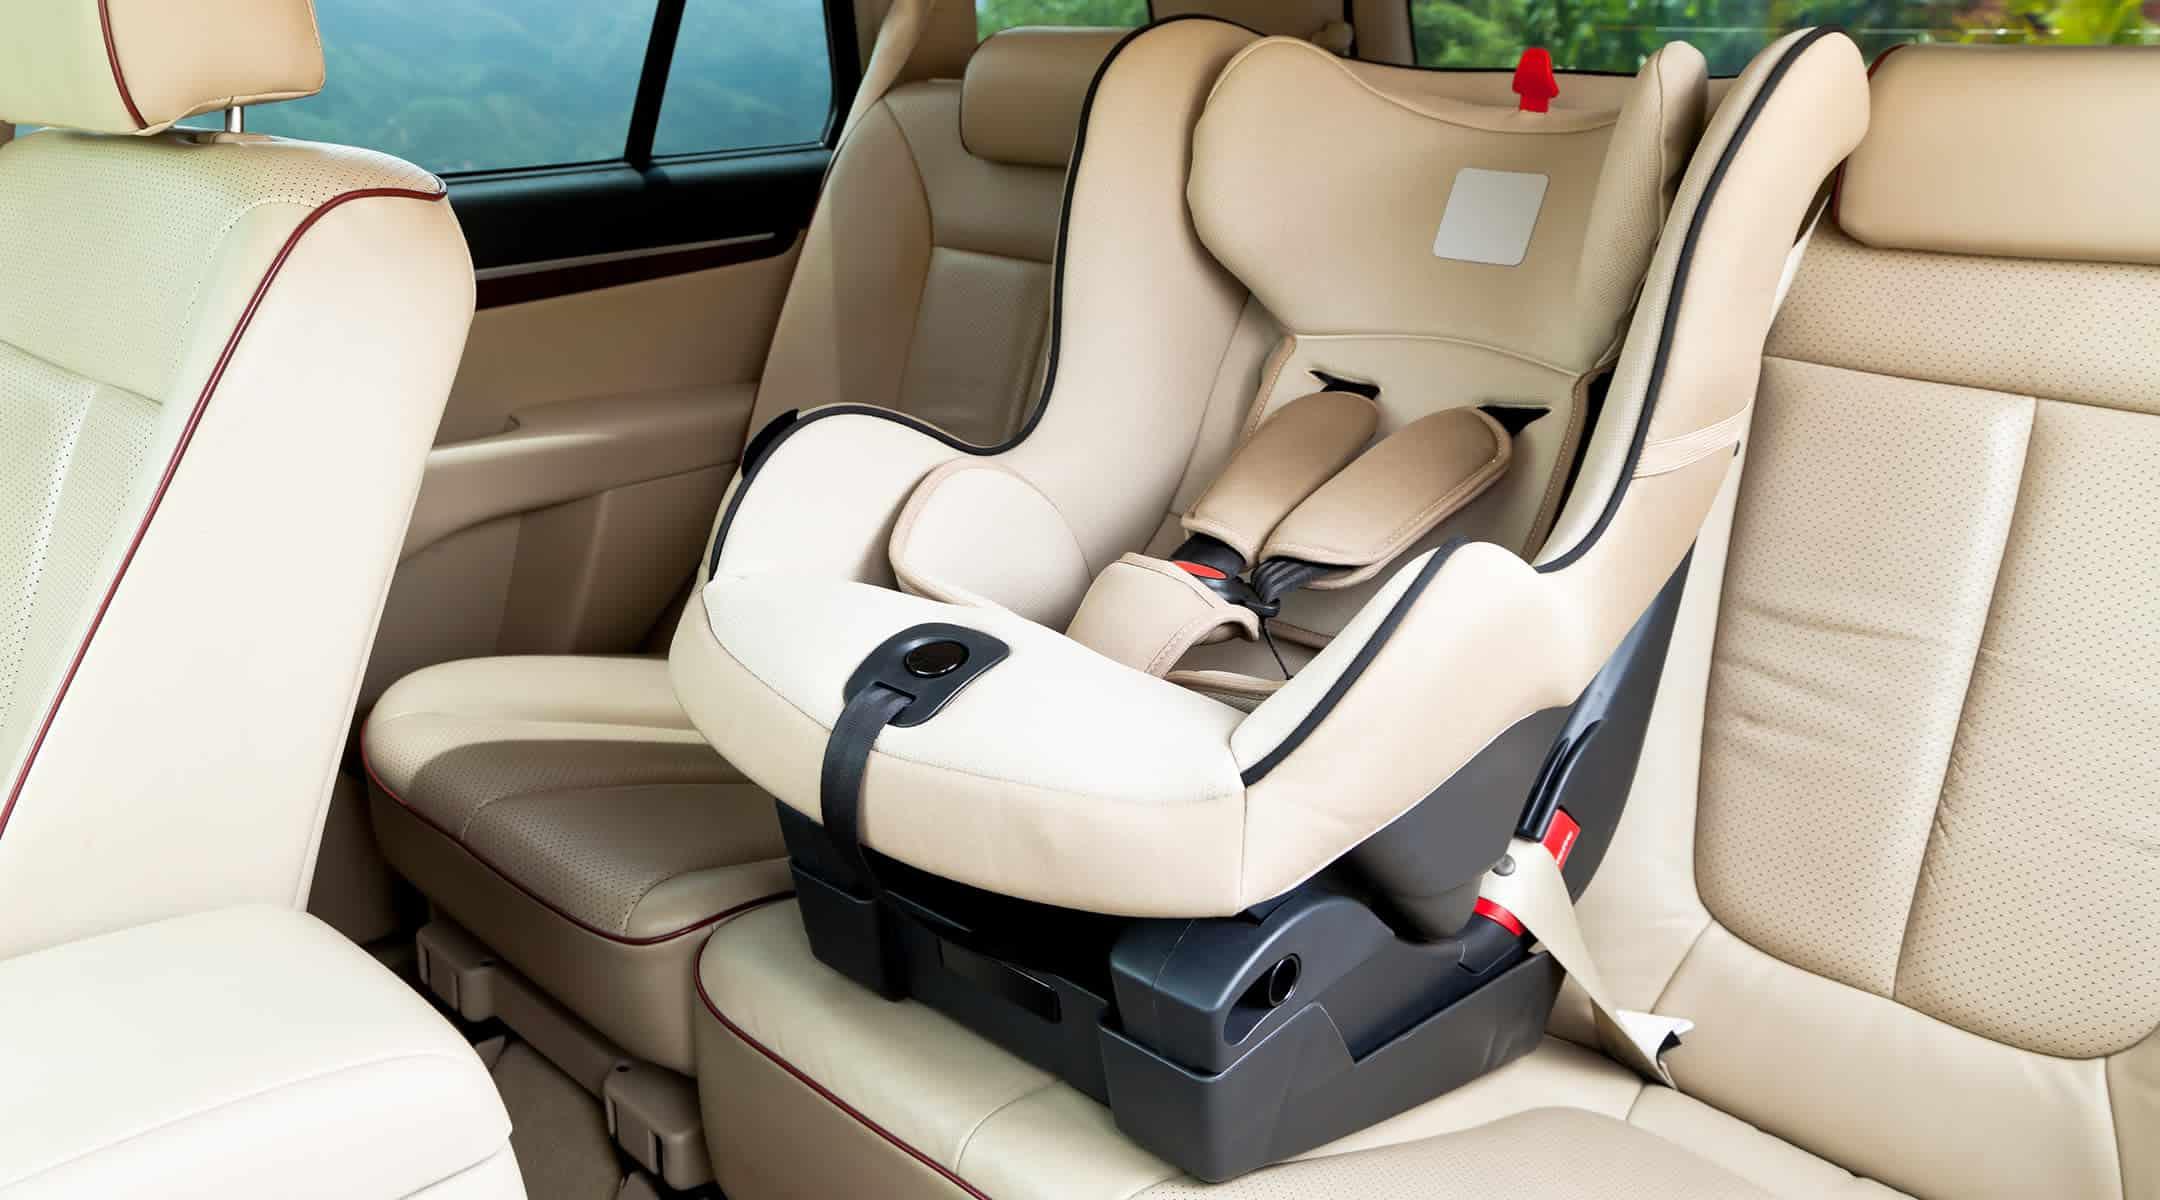 California Car Seat Laws for babies